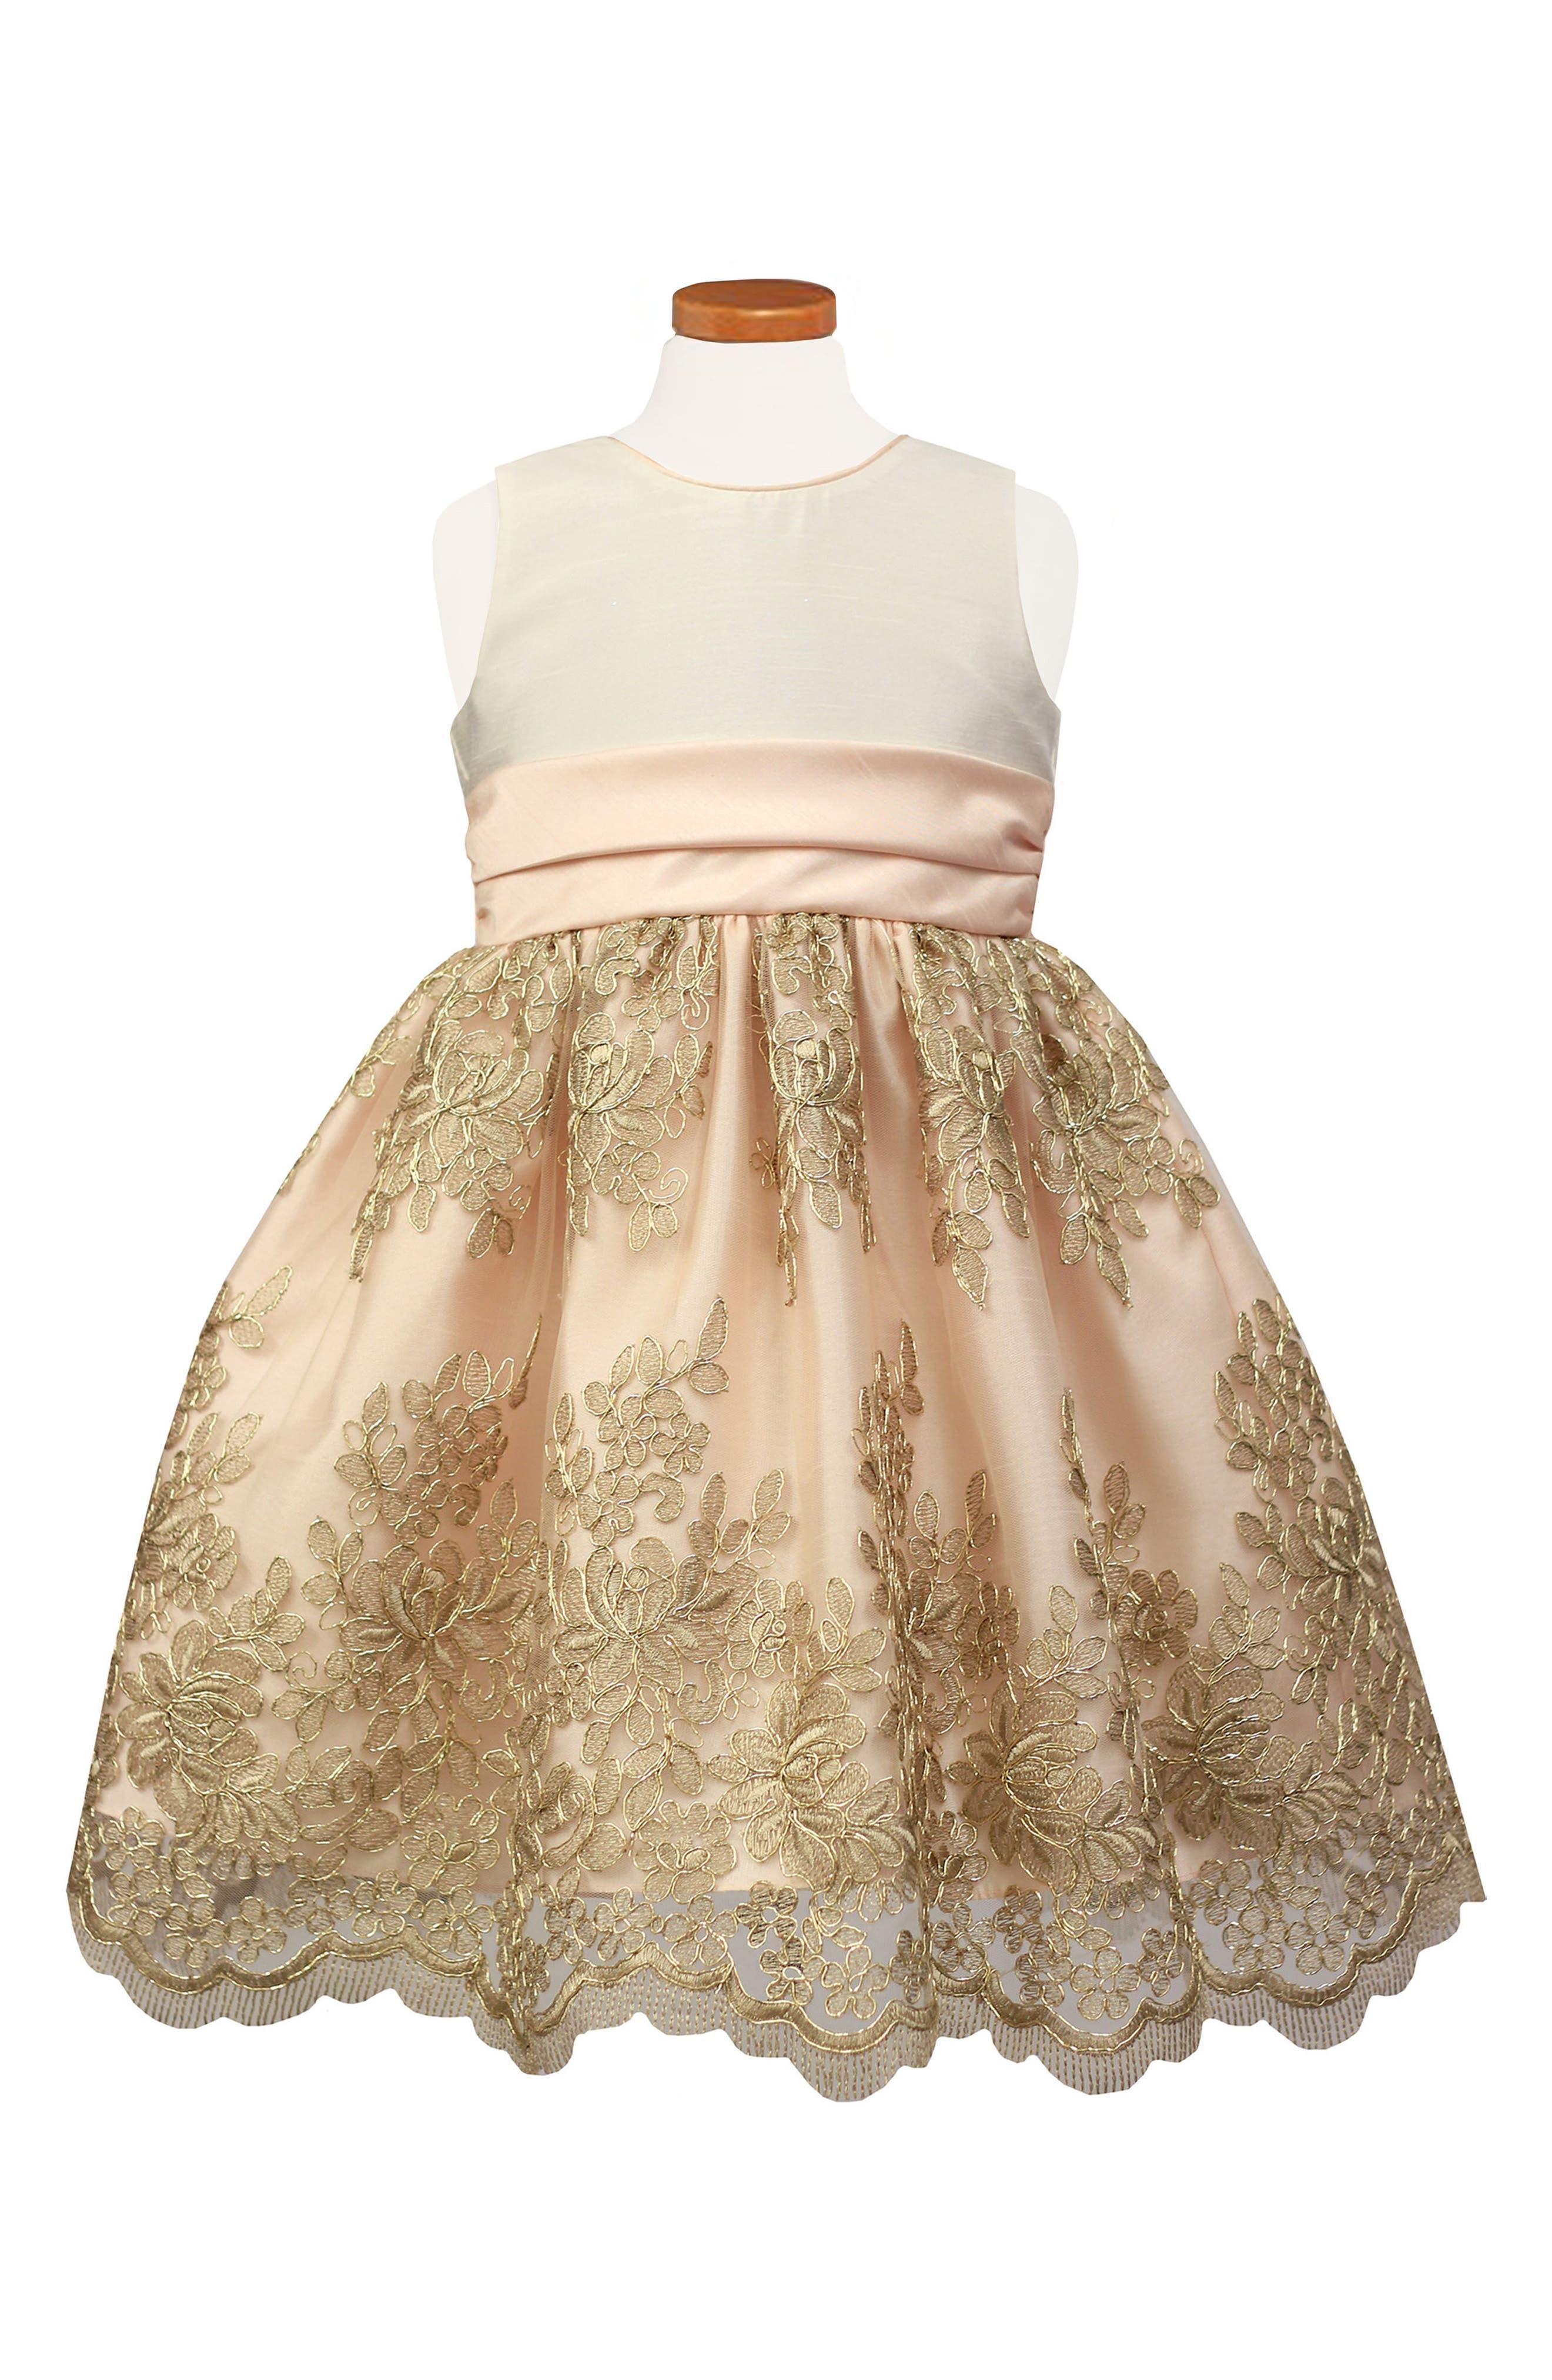 Main Image - Sorbet Floral Embroidered Party Dress (Toddler Girls, Little Girls & Big Girls)